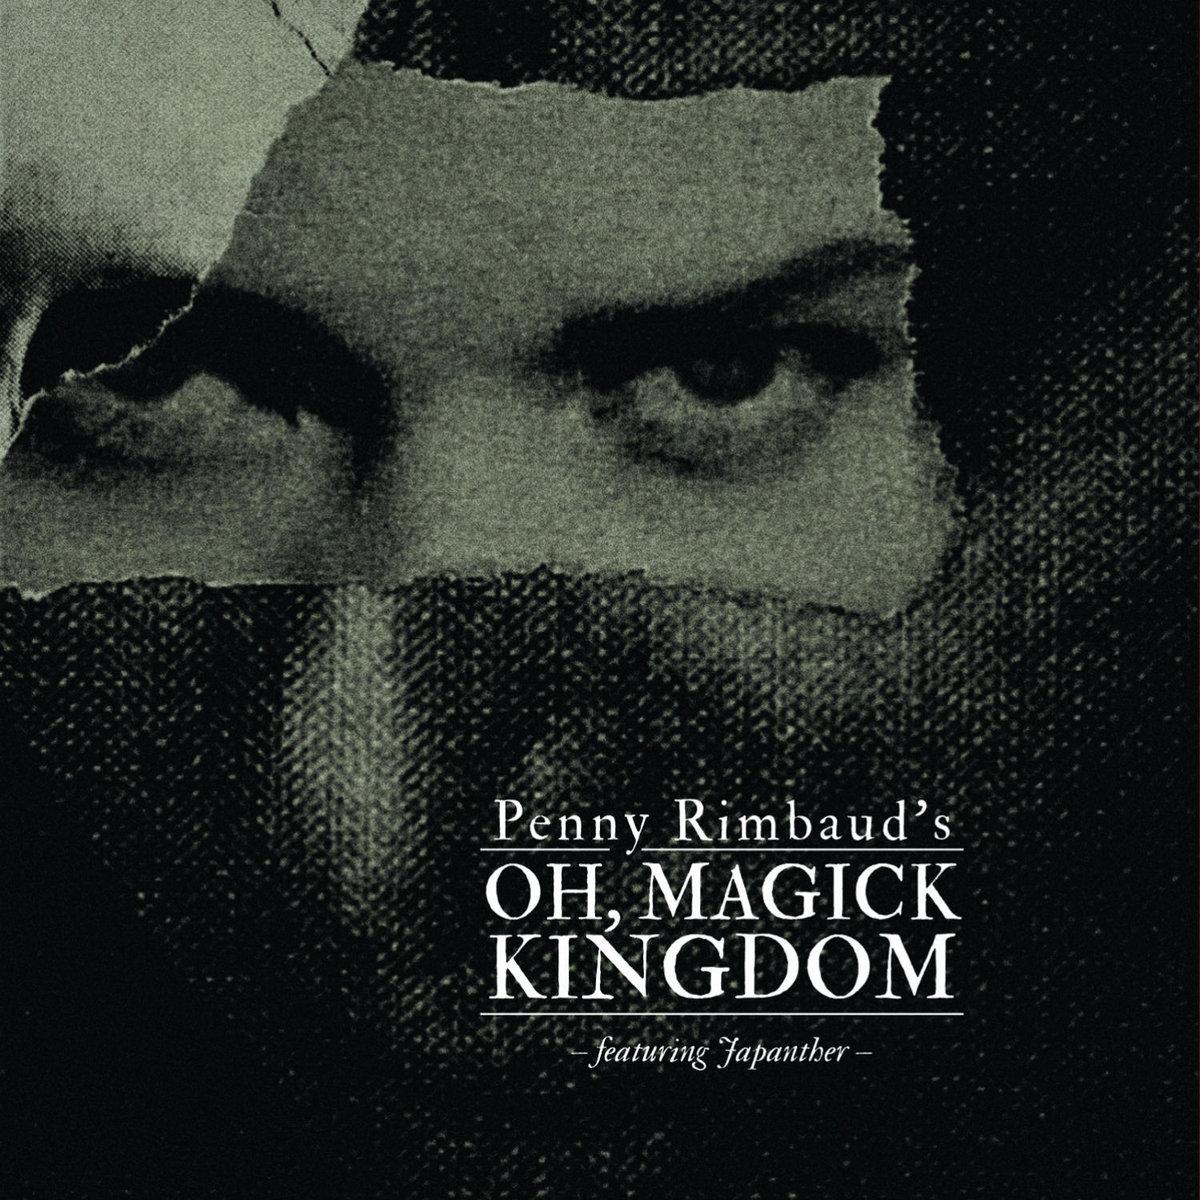 Oh Magick Kingdom (CSR259CD) | Cold Spring